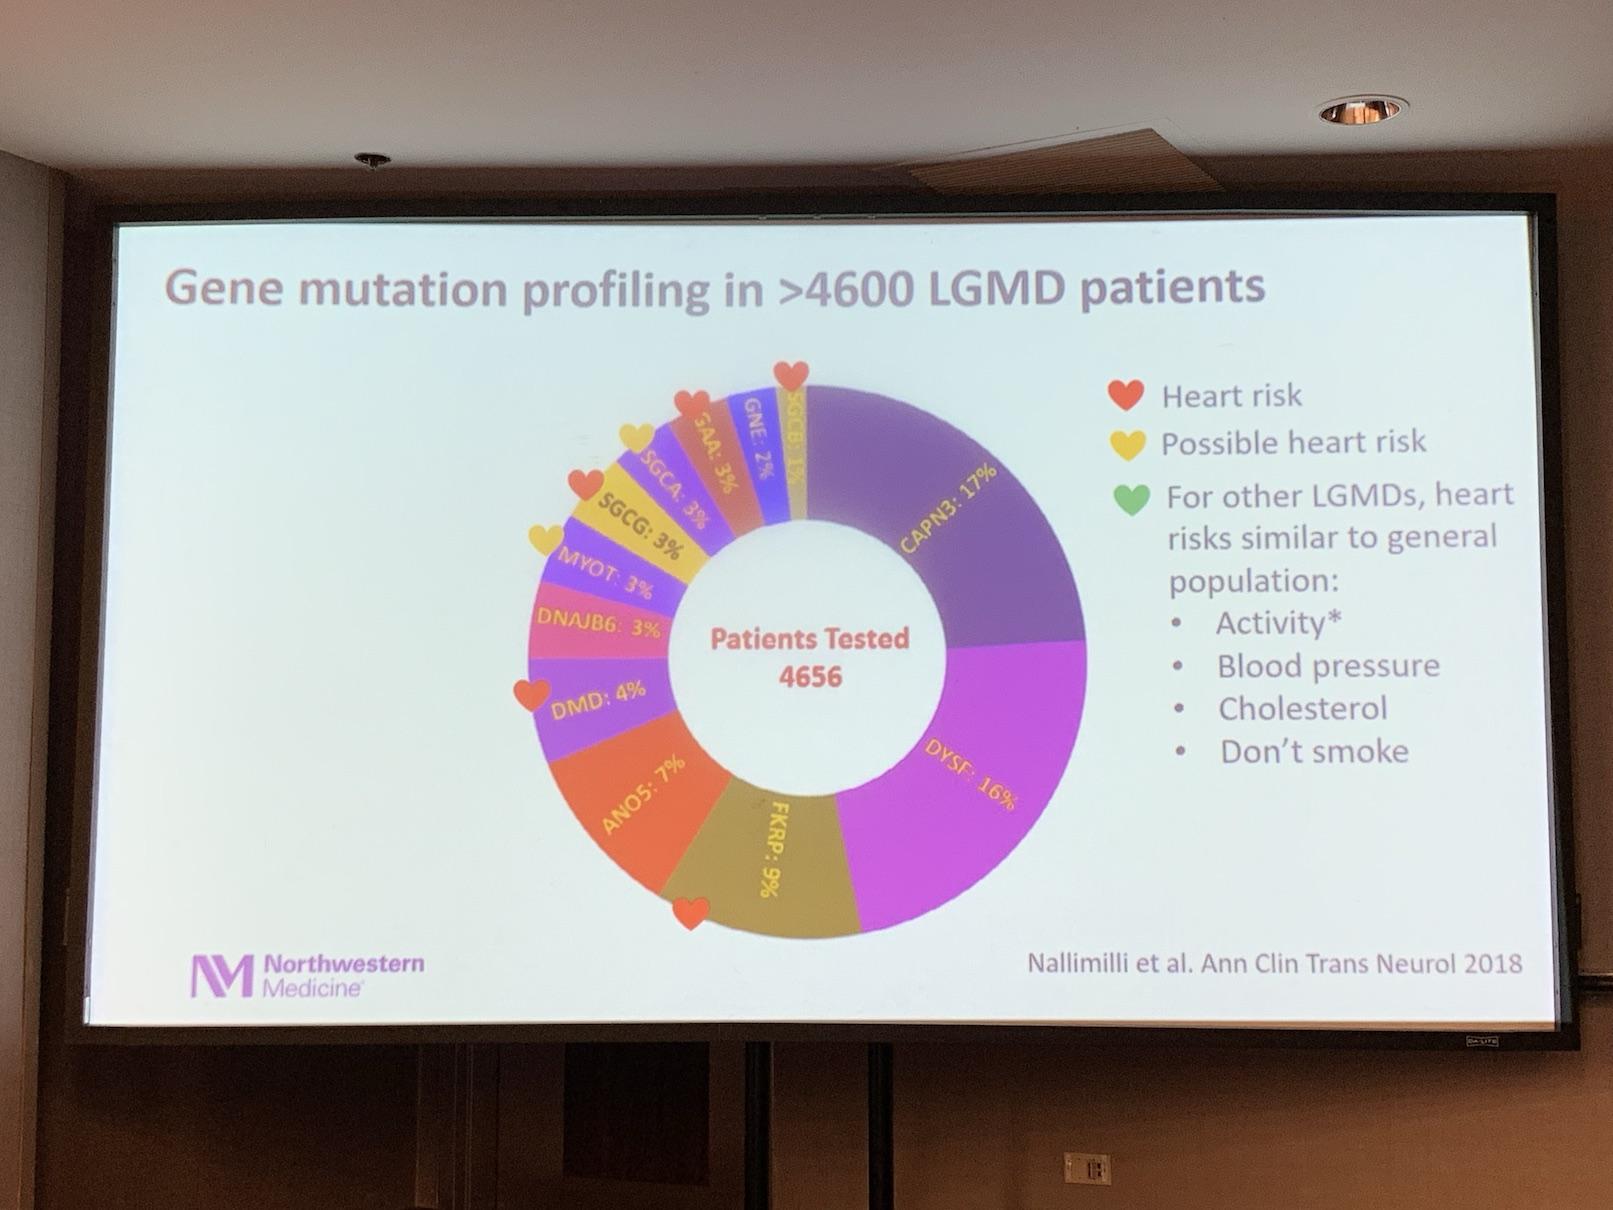 LGMD risque cardiaque | Dr Elizabeth McNally